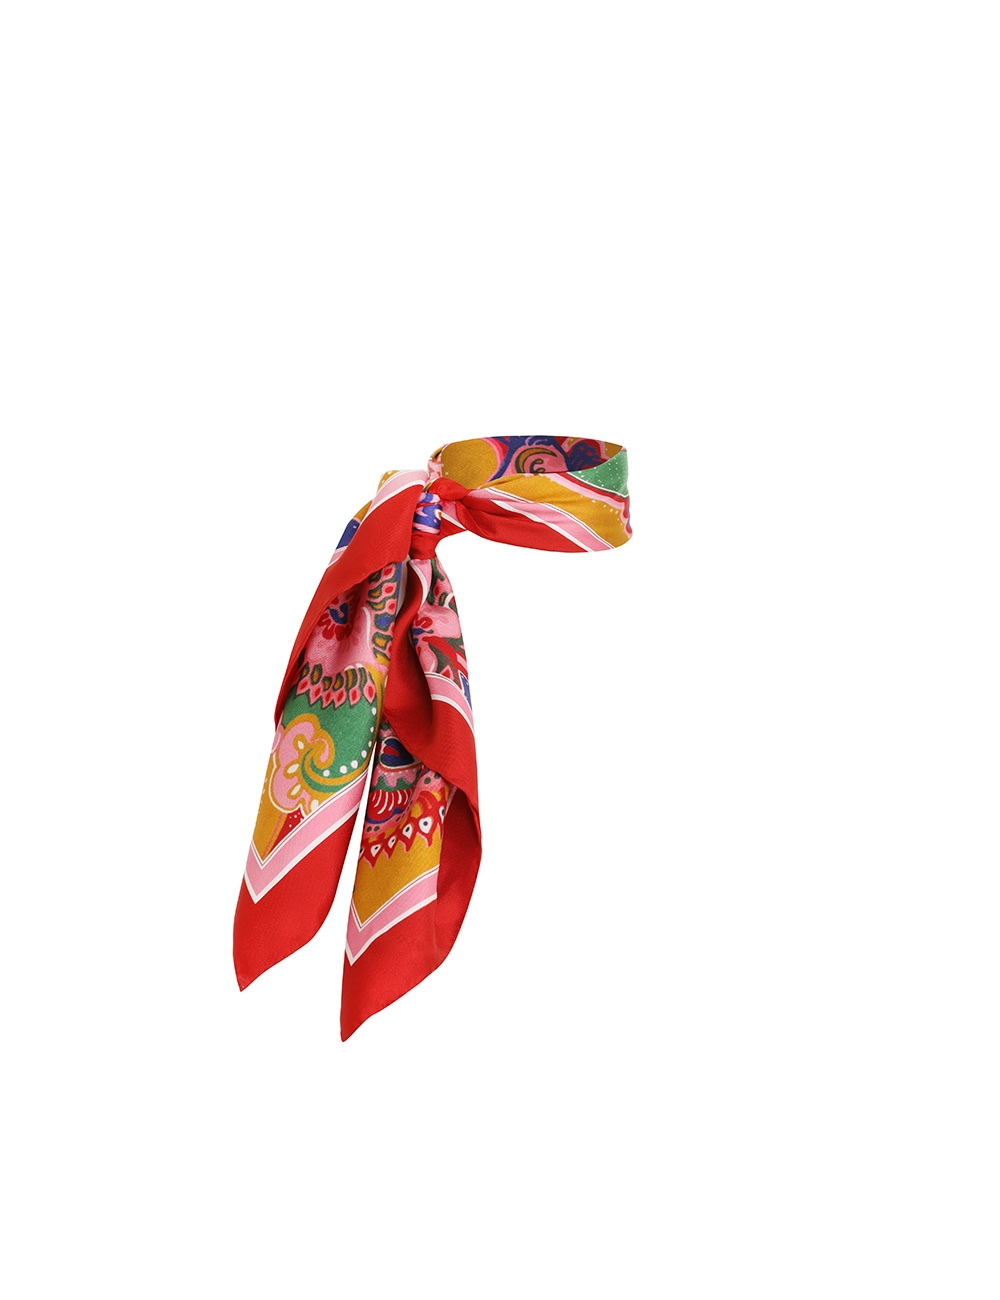 The Lovestruck Silk Headscarf